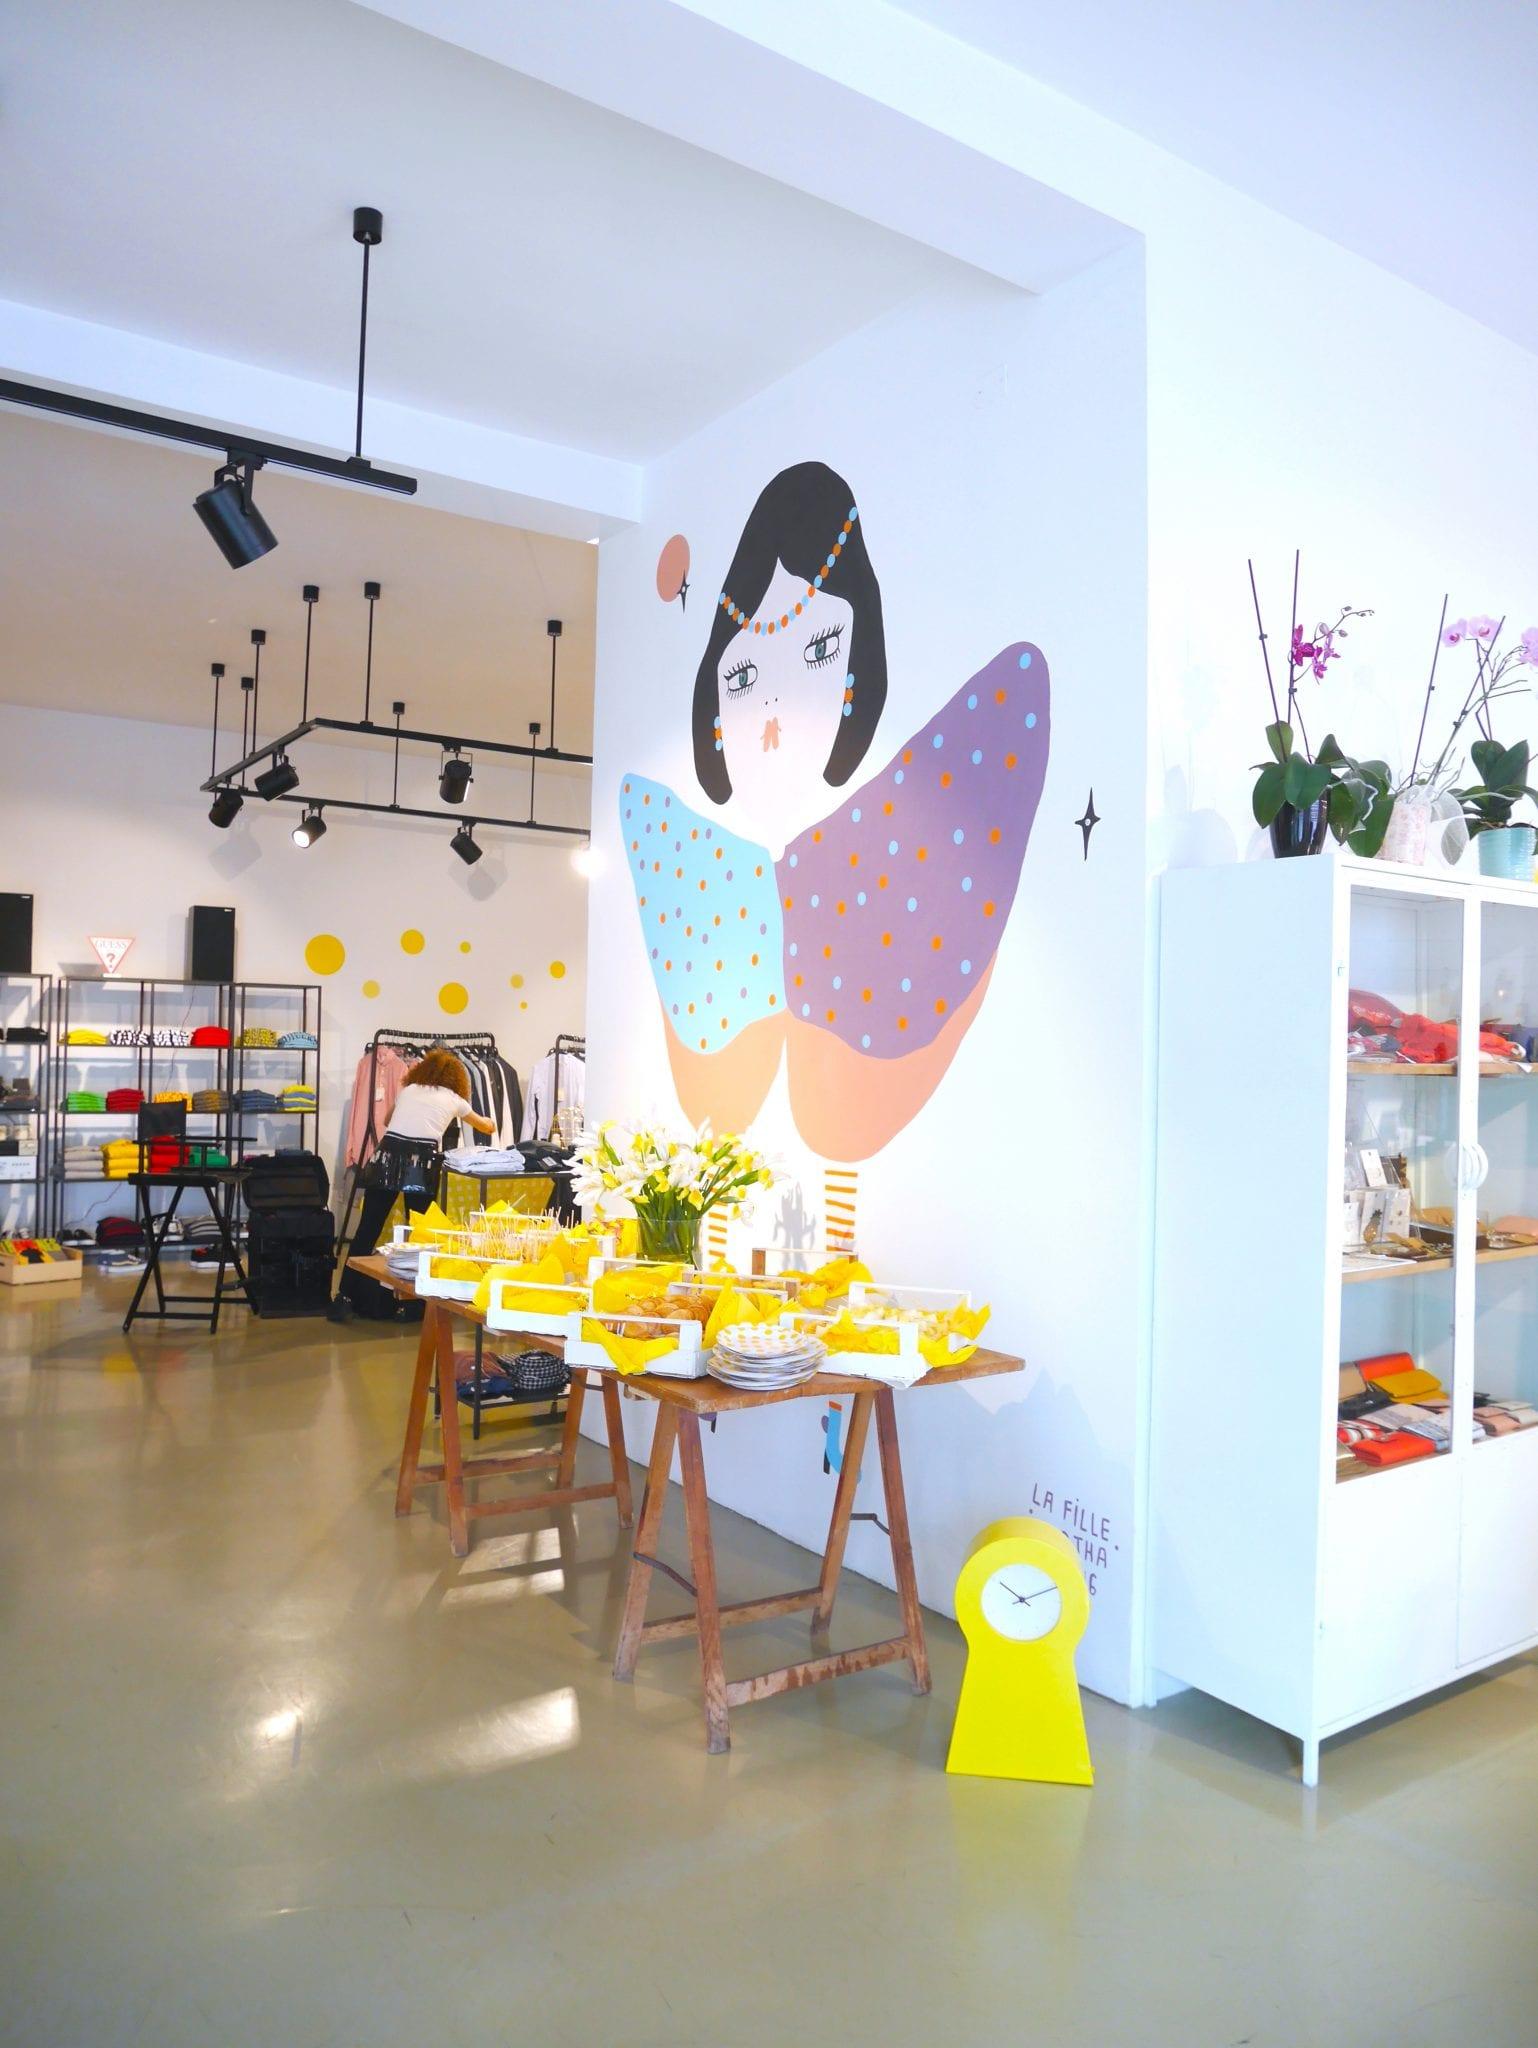 Murales tavolo giallo fashi/off - LePlume